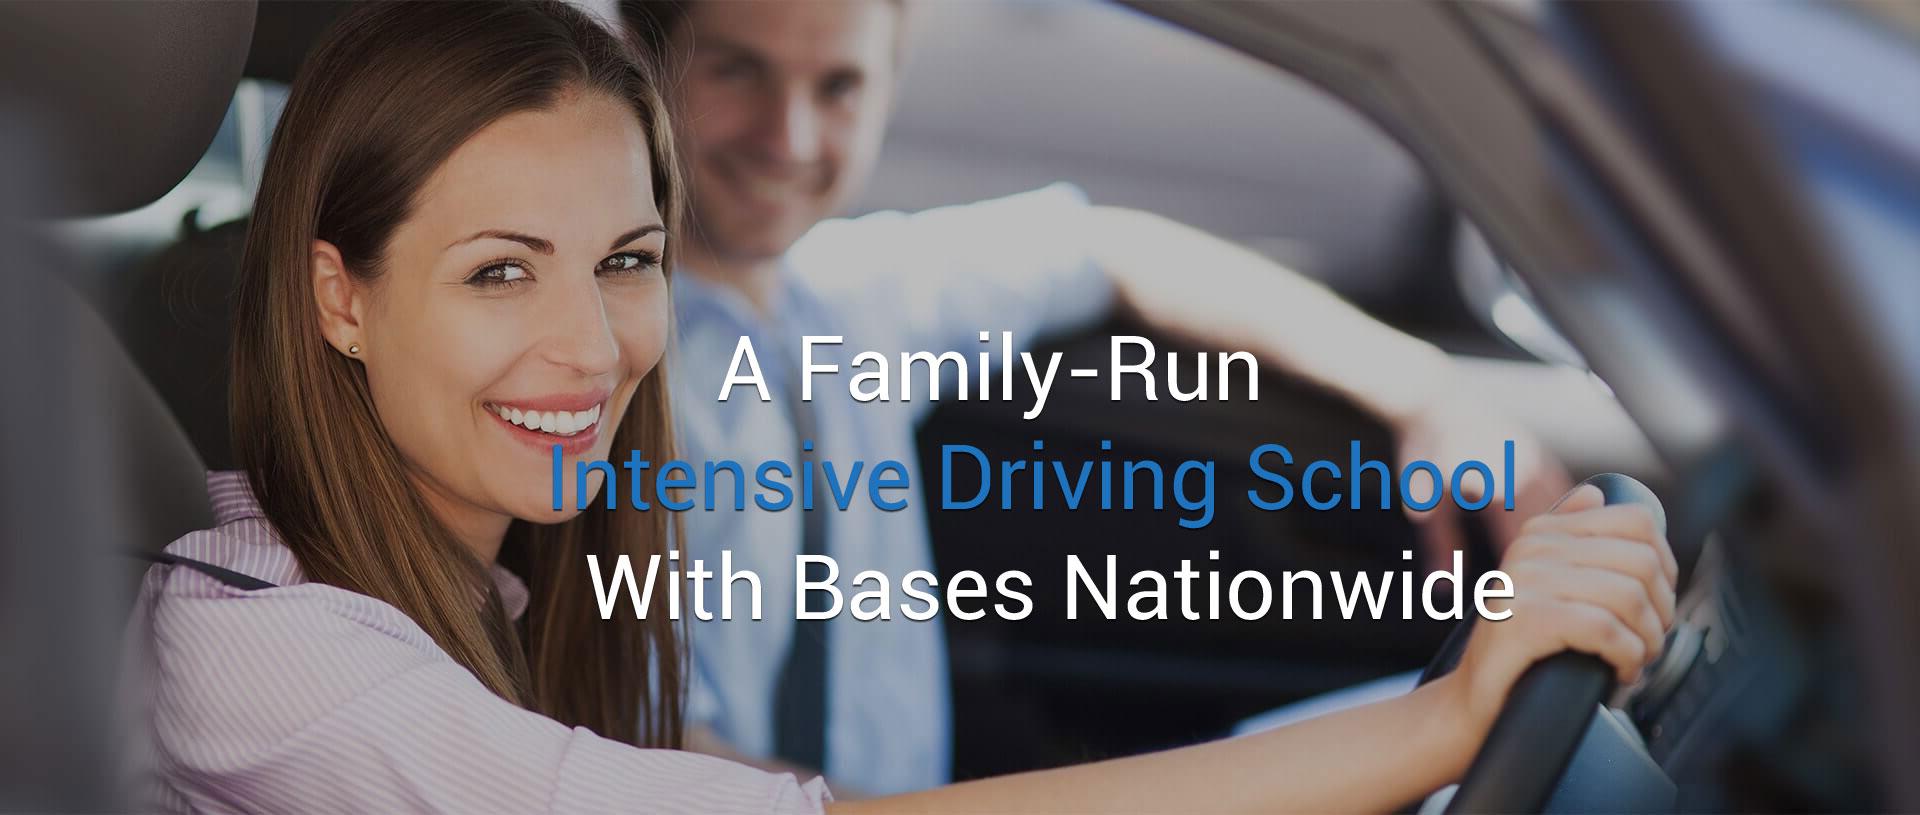 APASS4U - Nationwide Driving School